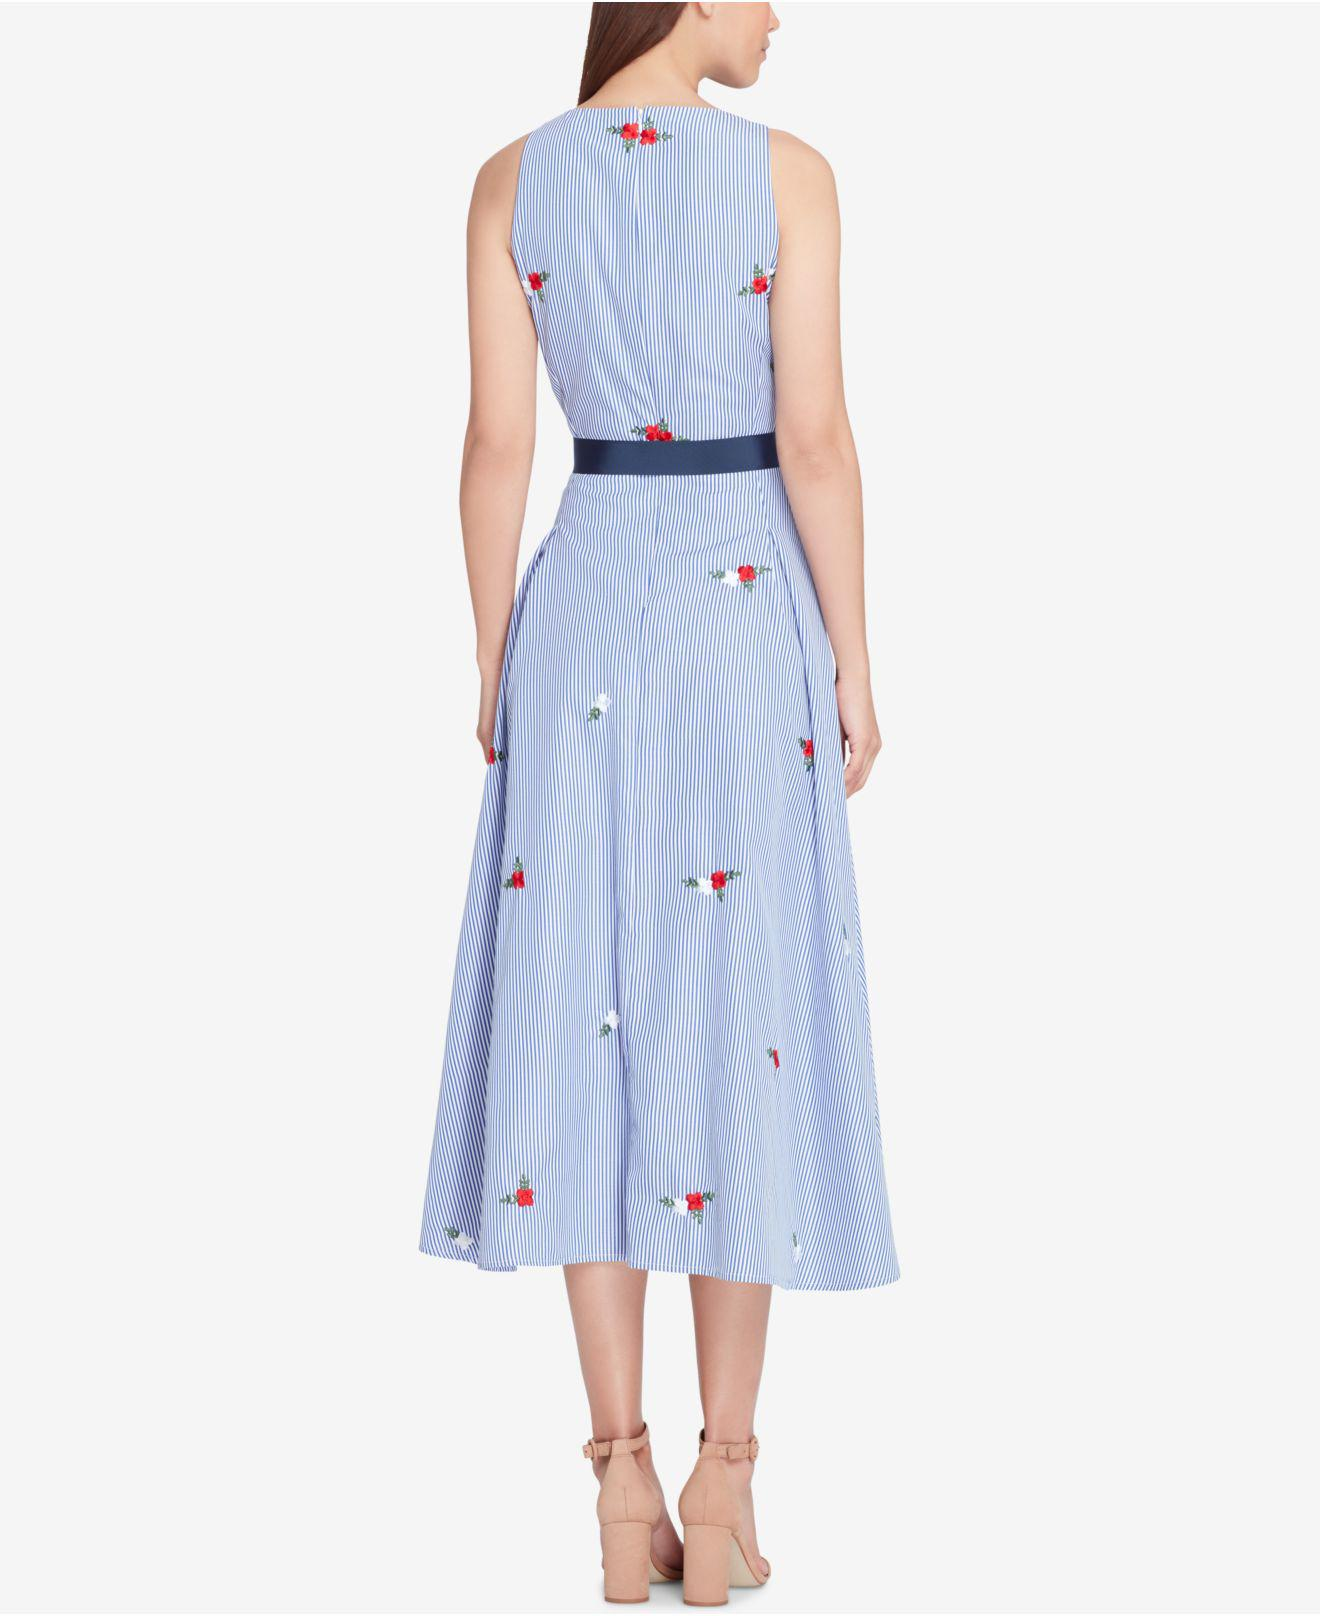 Tahari Embroidered Fit Amp Flare Midi Dress In Blue Lyst